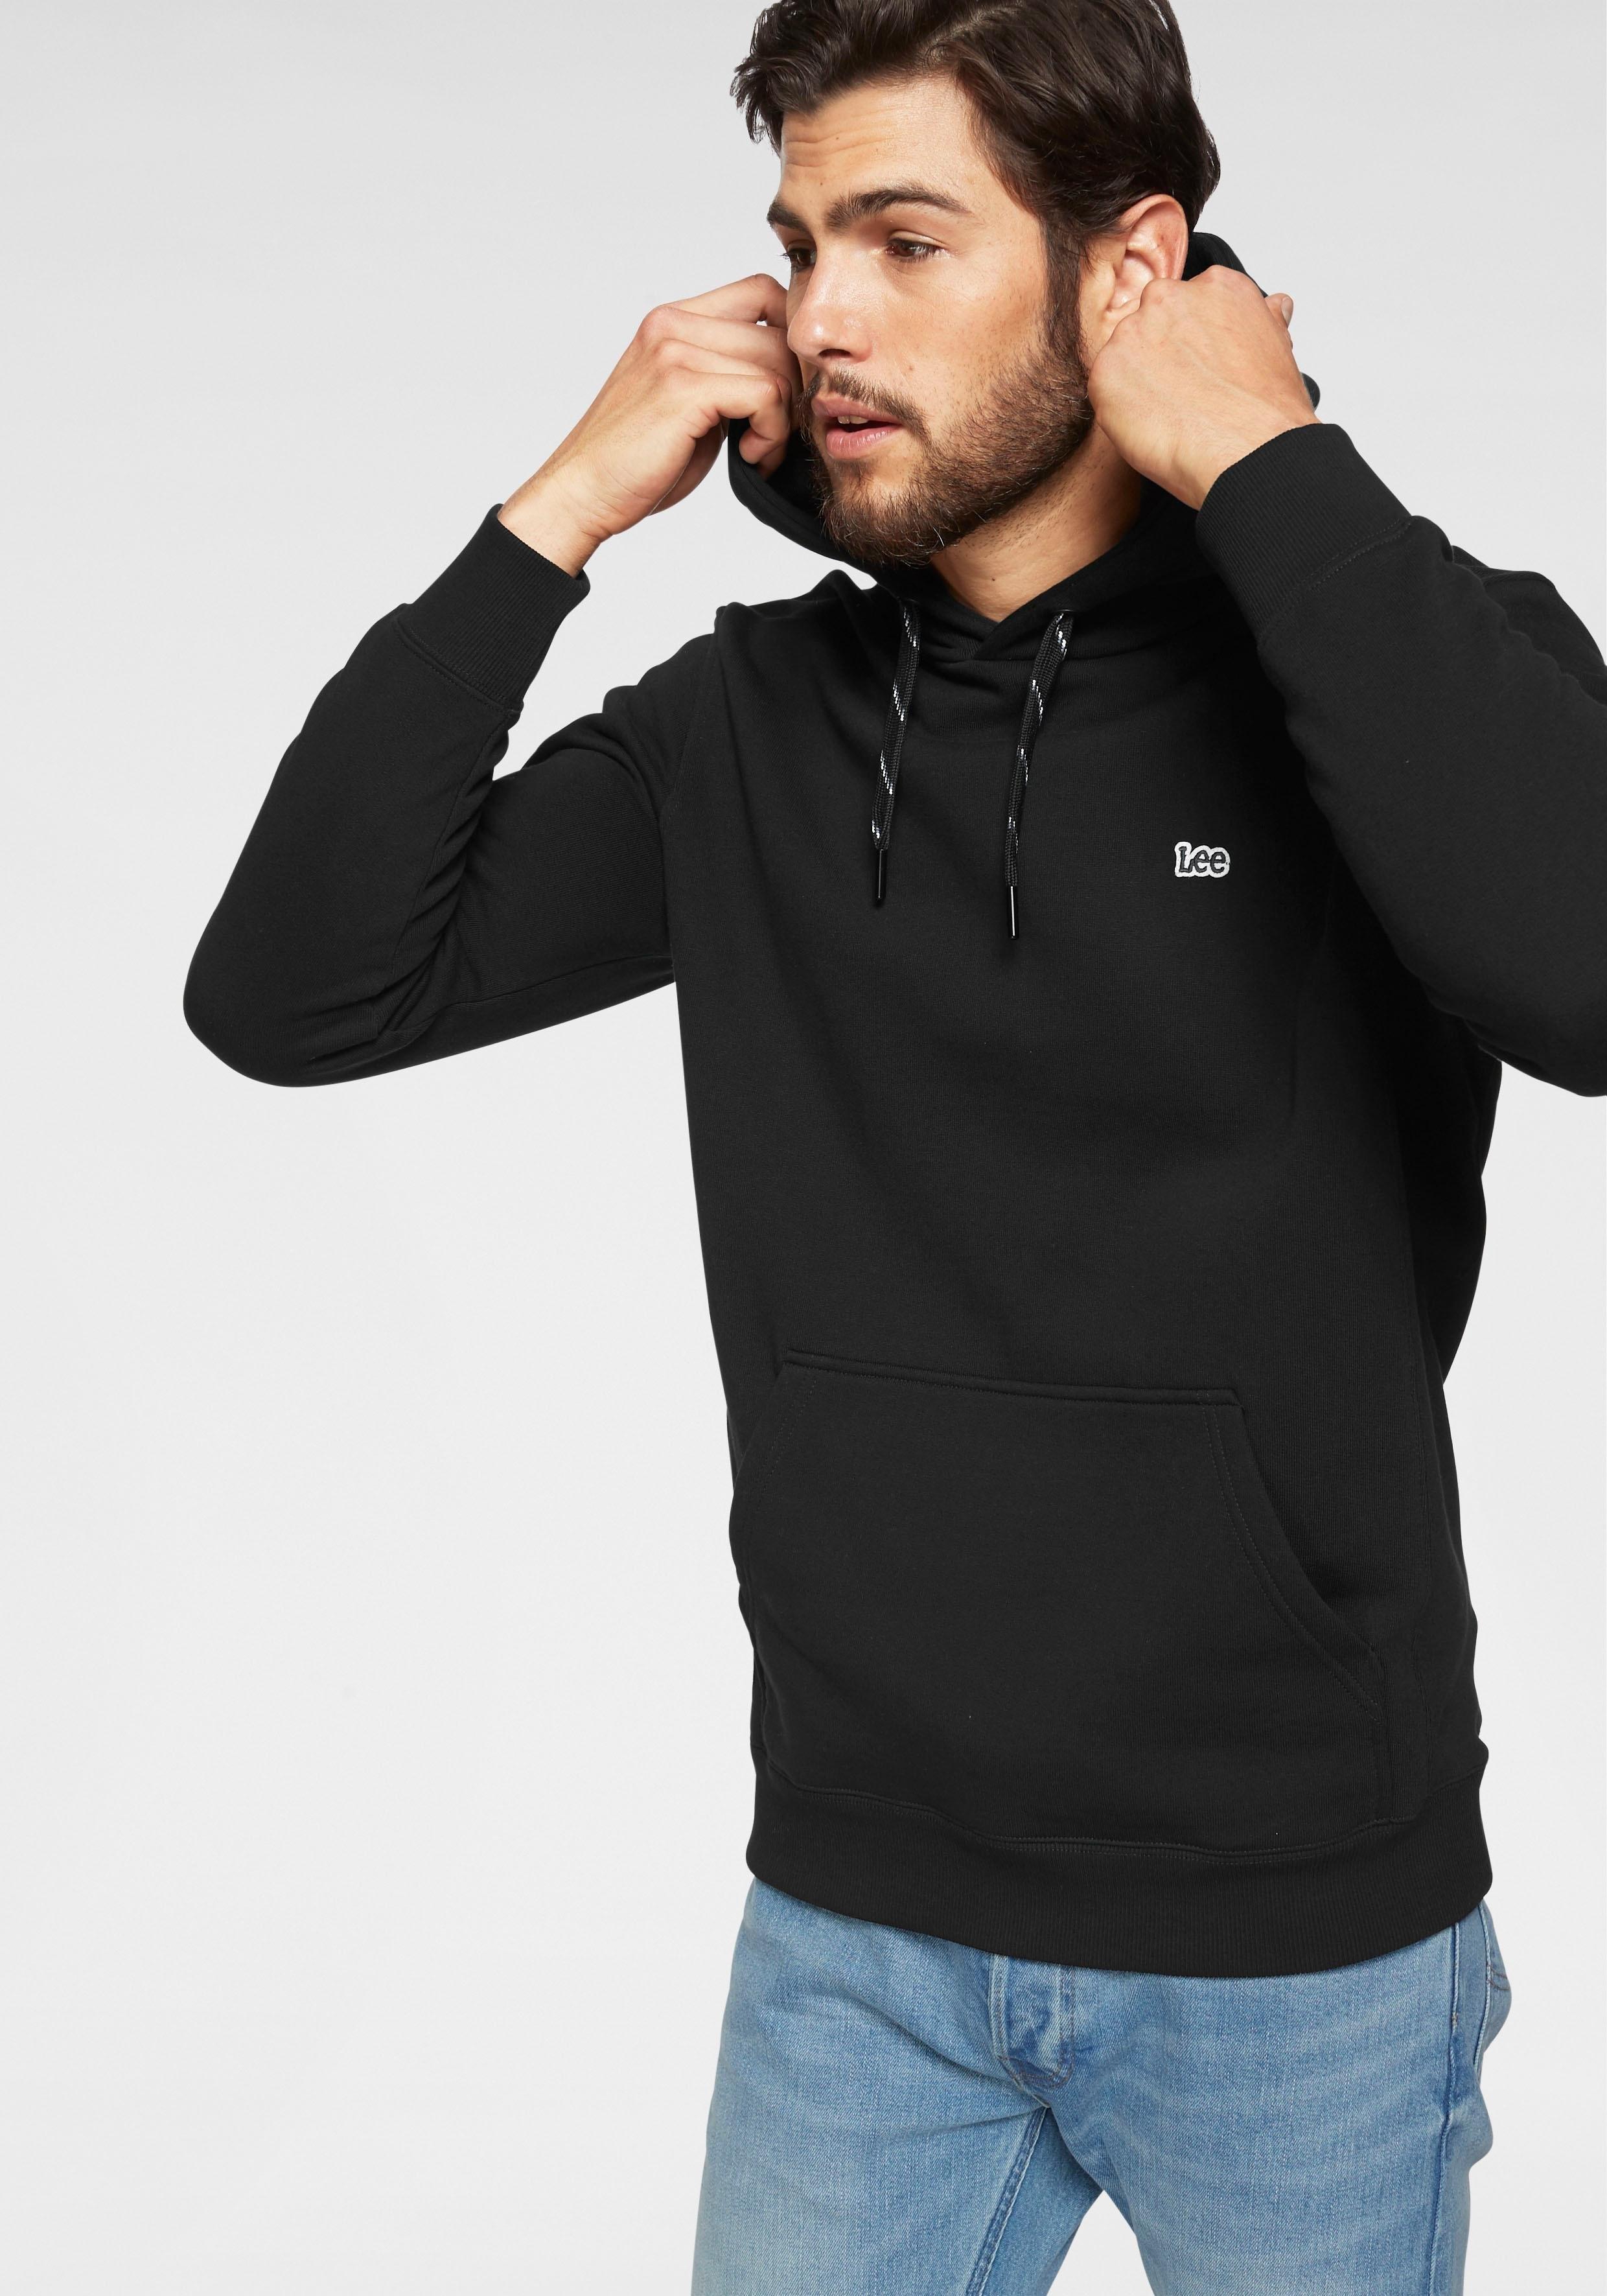 Lee ® hoodie goedkoop op otto.nl kopen